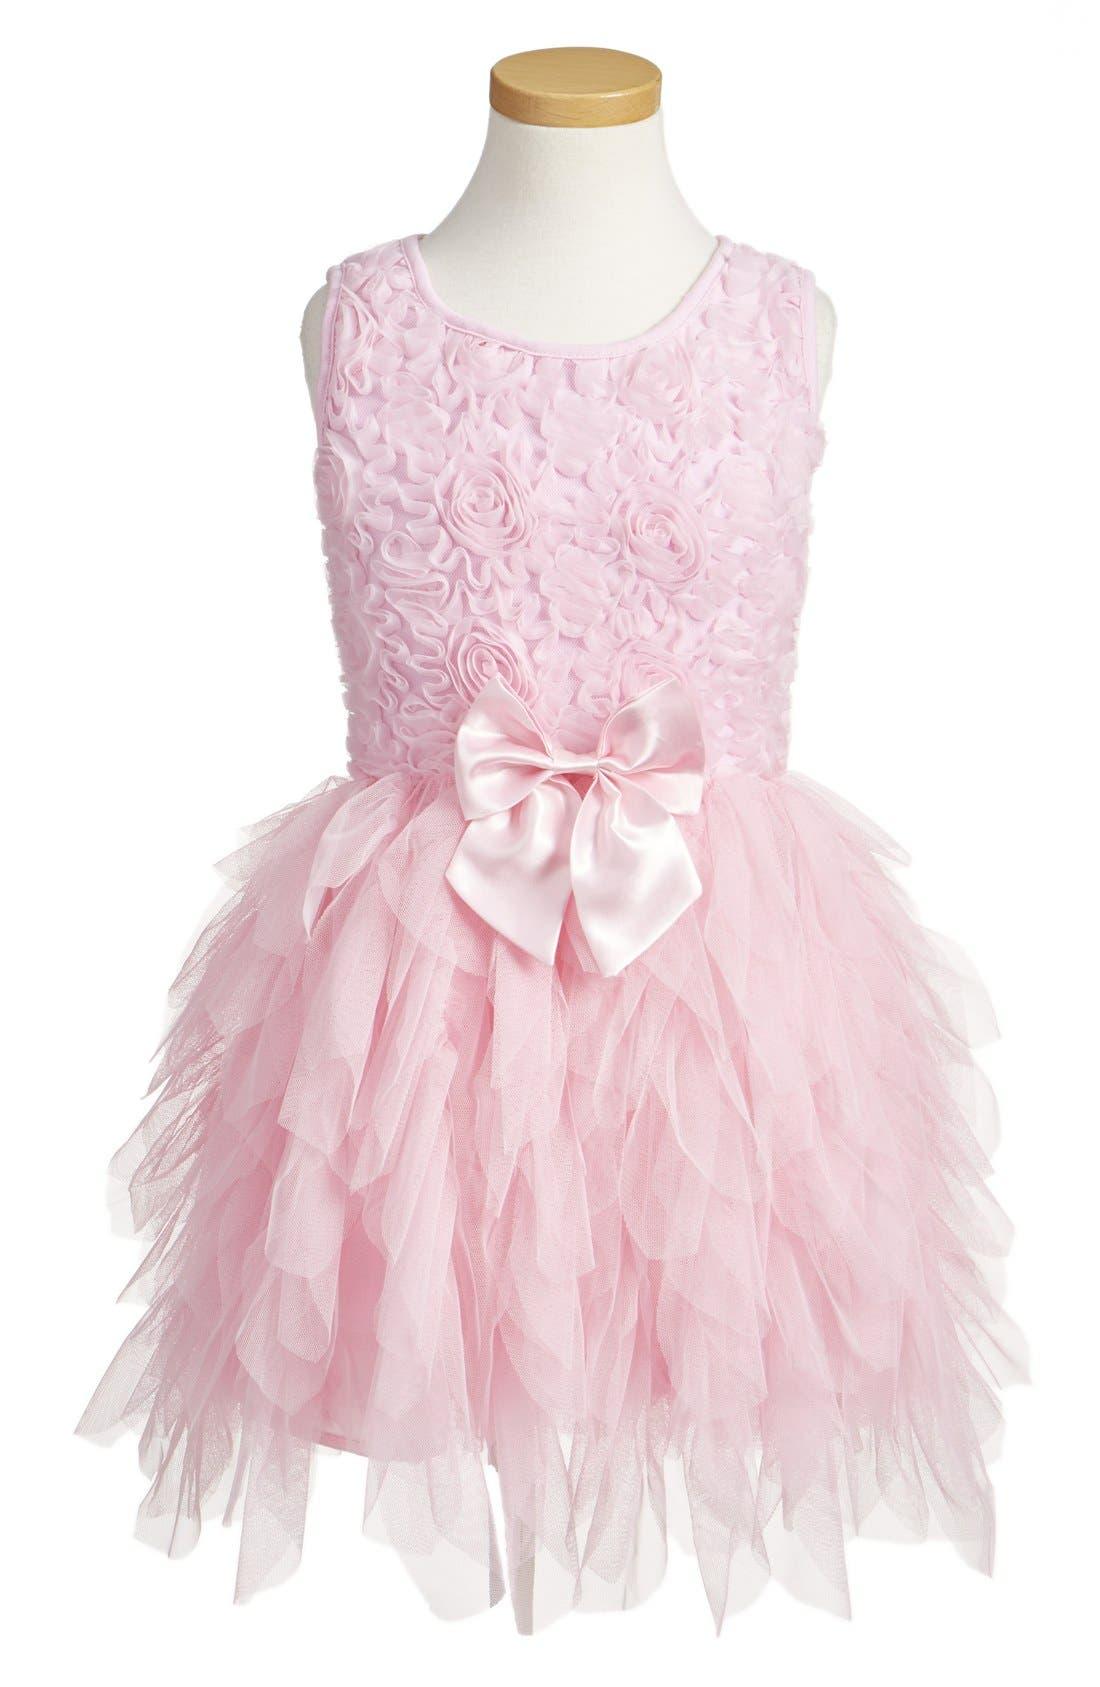 POPATU Ribbon Rosette Sleeveless Tulle Dress